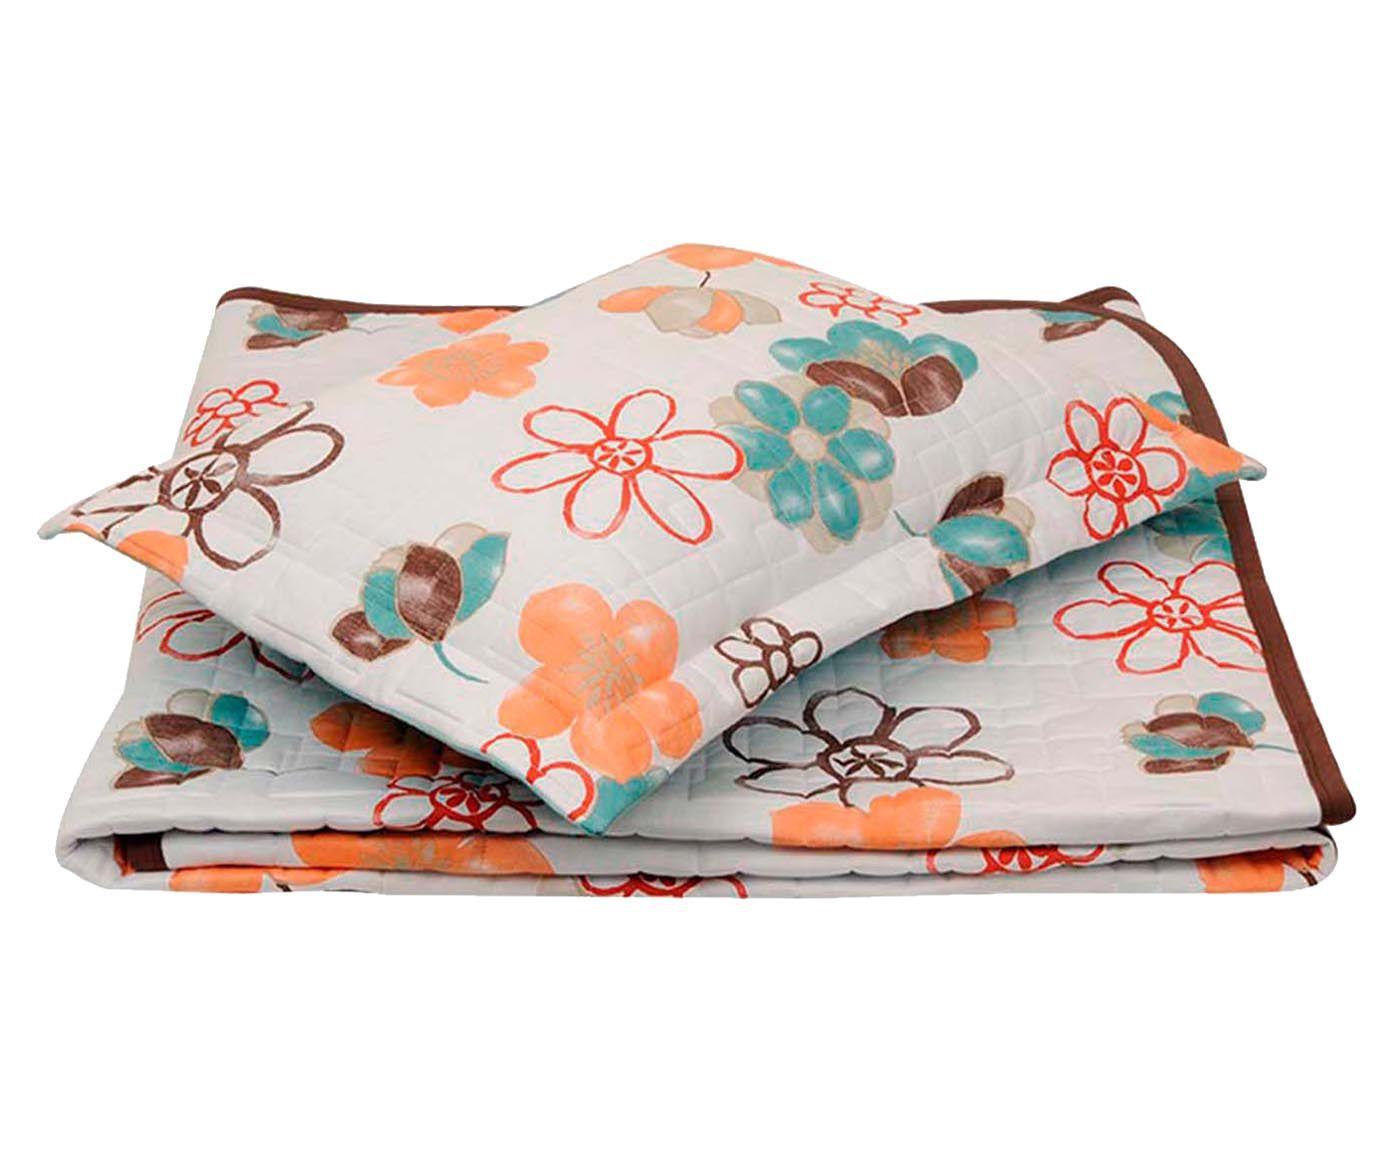 Conjunto de cobre-leito anne marie - para cama de casal | Westwing.com.br